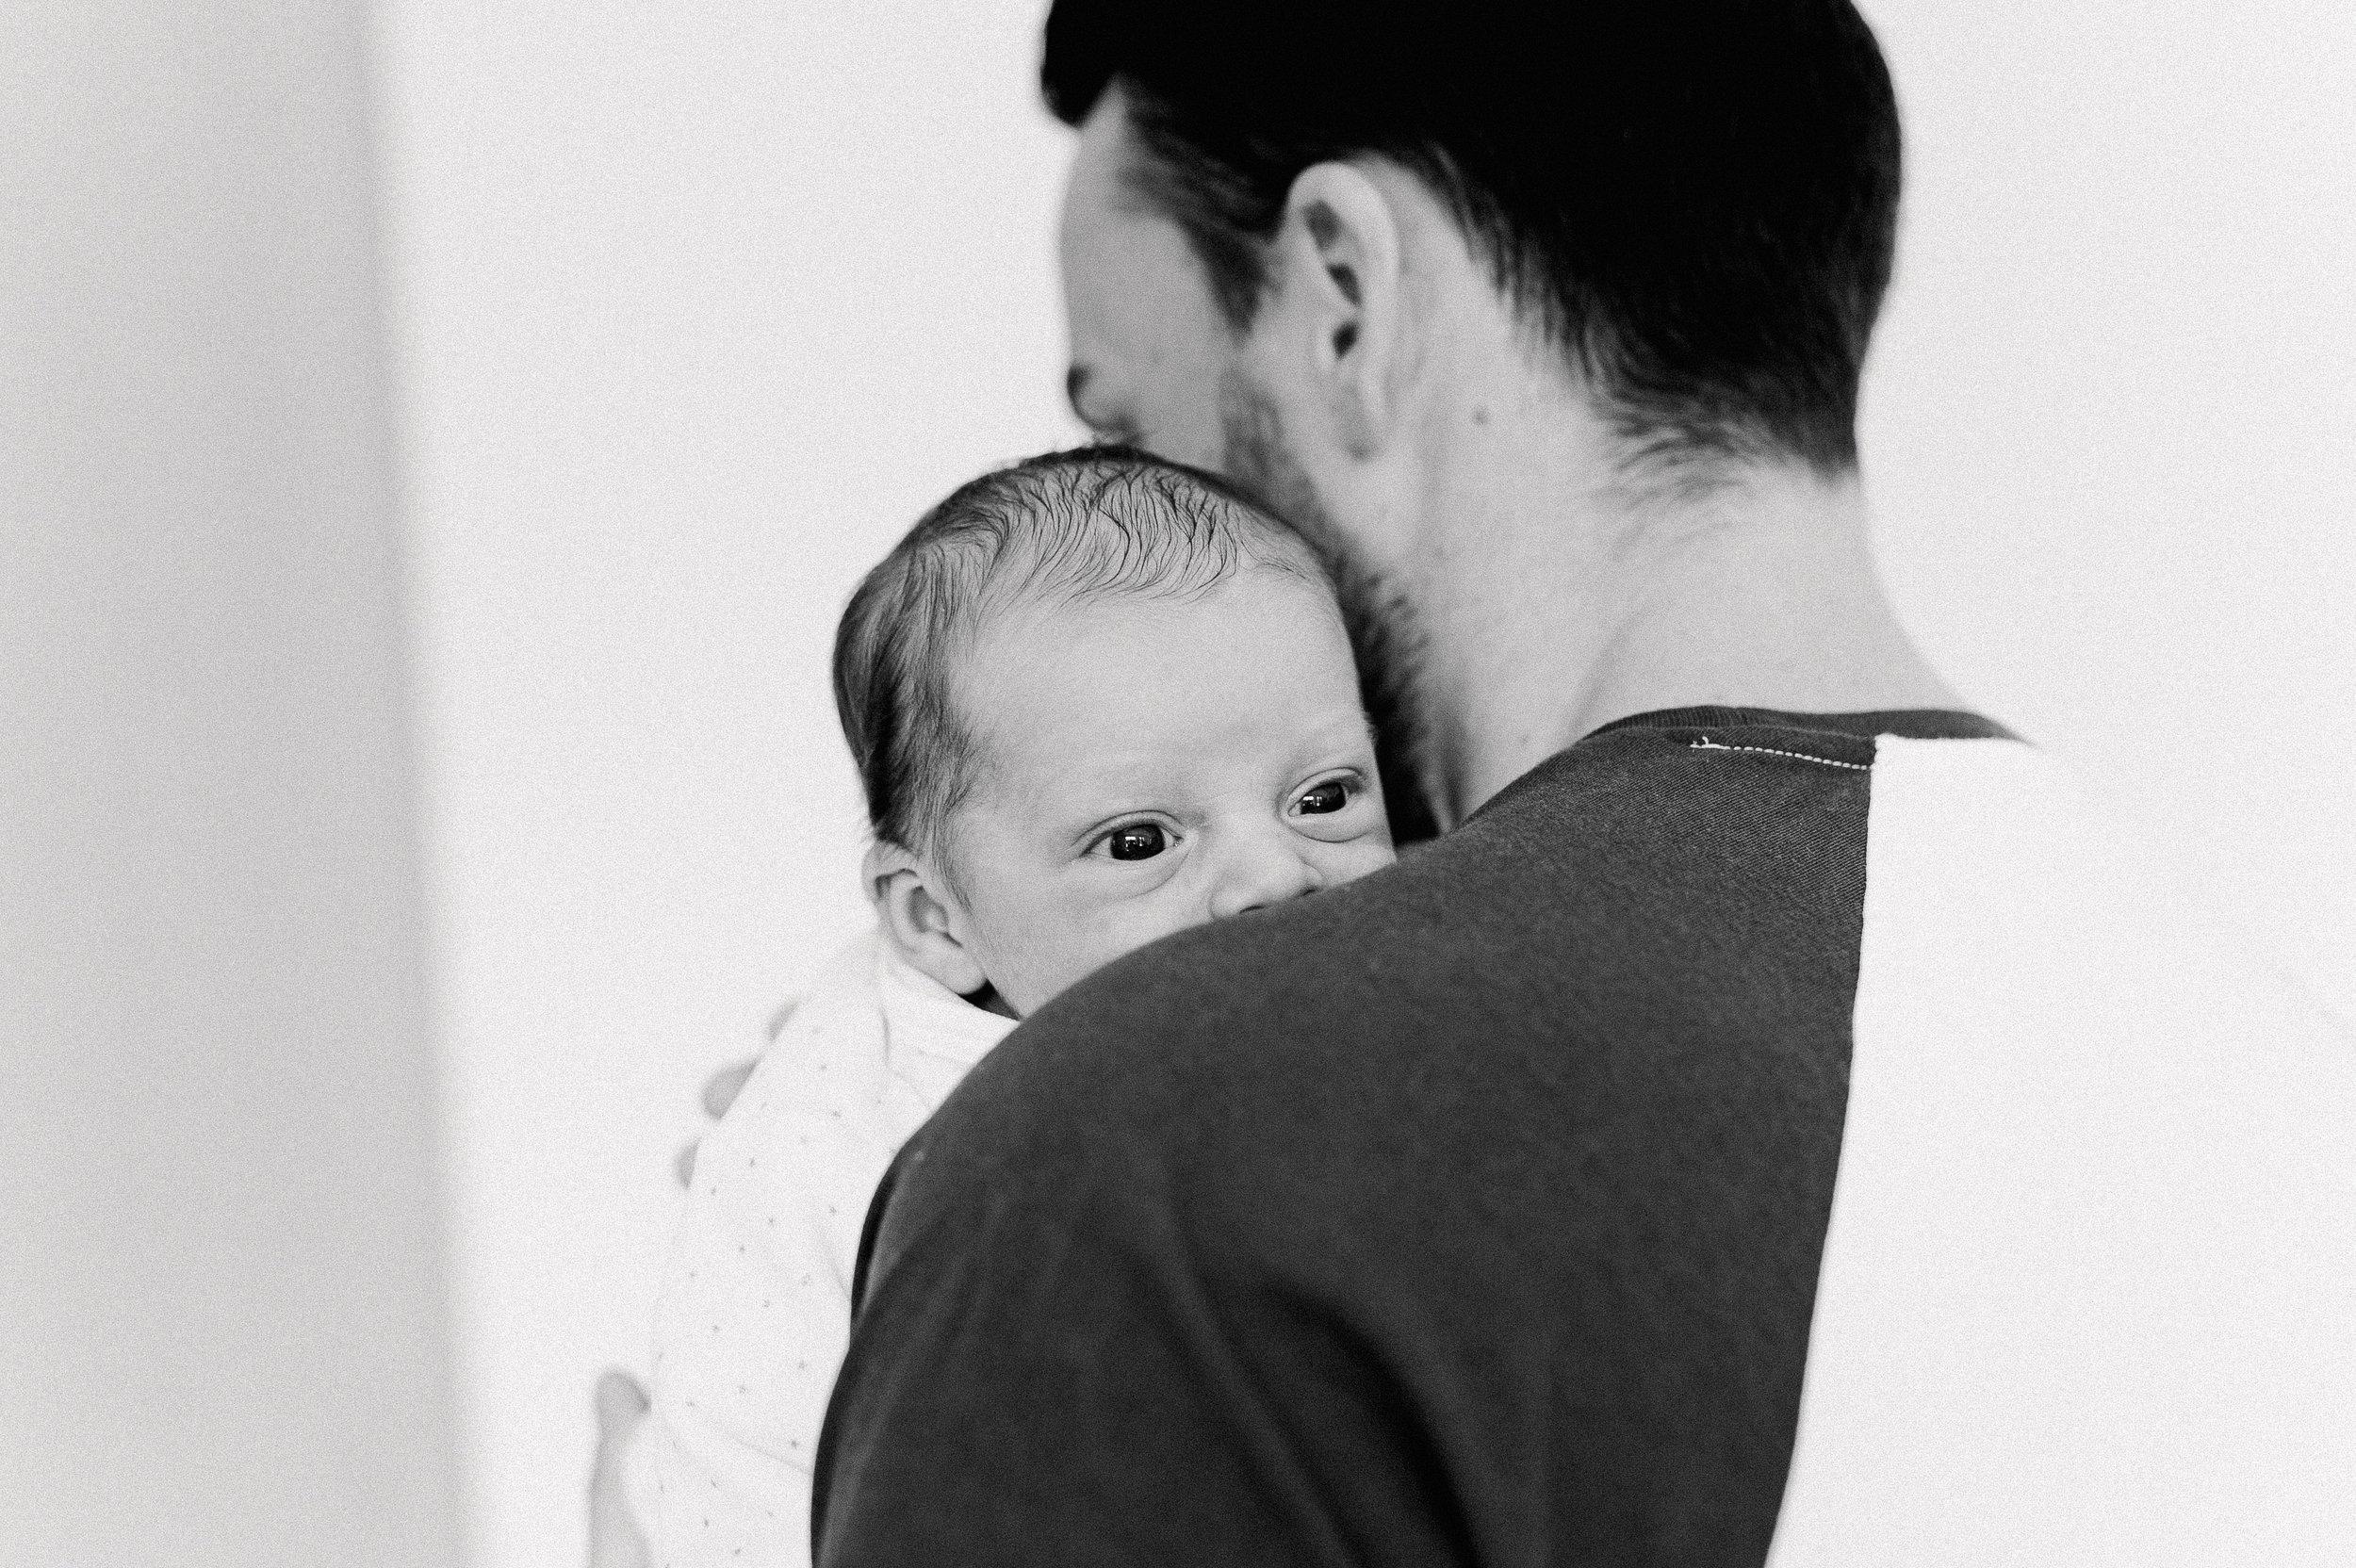 Anna-Hari-Photography-Familienshooting-Neugeborenenshooting-Mannheim-Heidelberg14.jpg